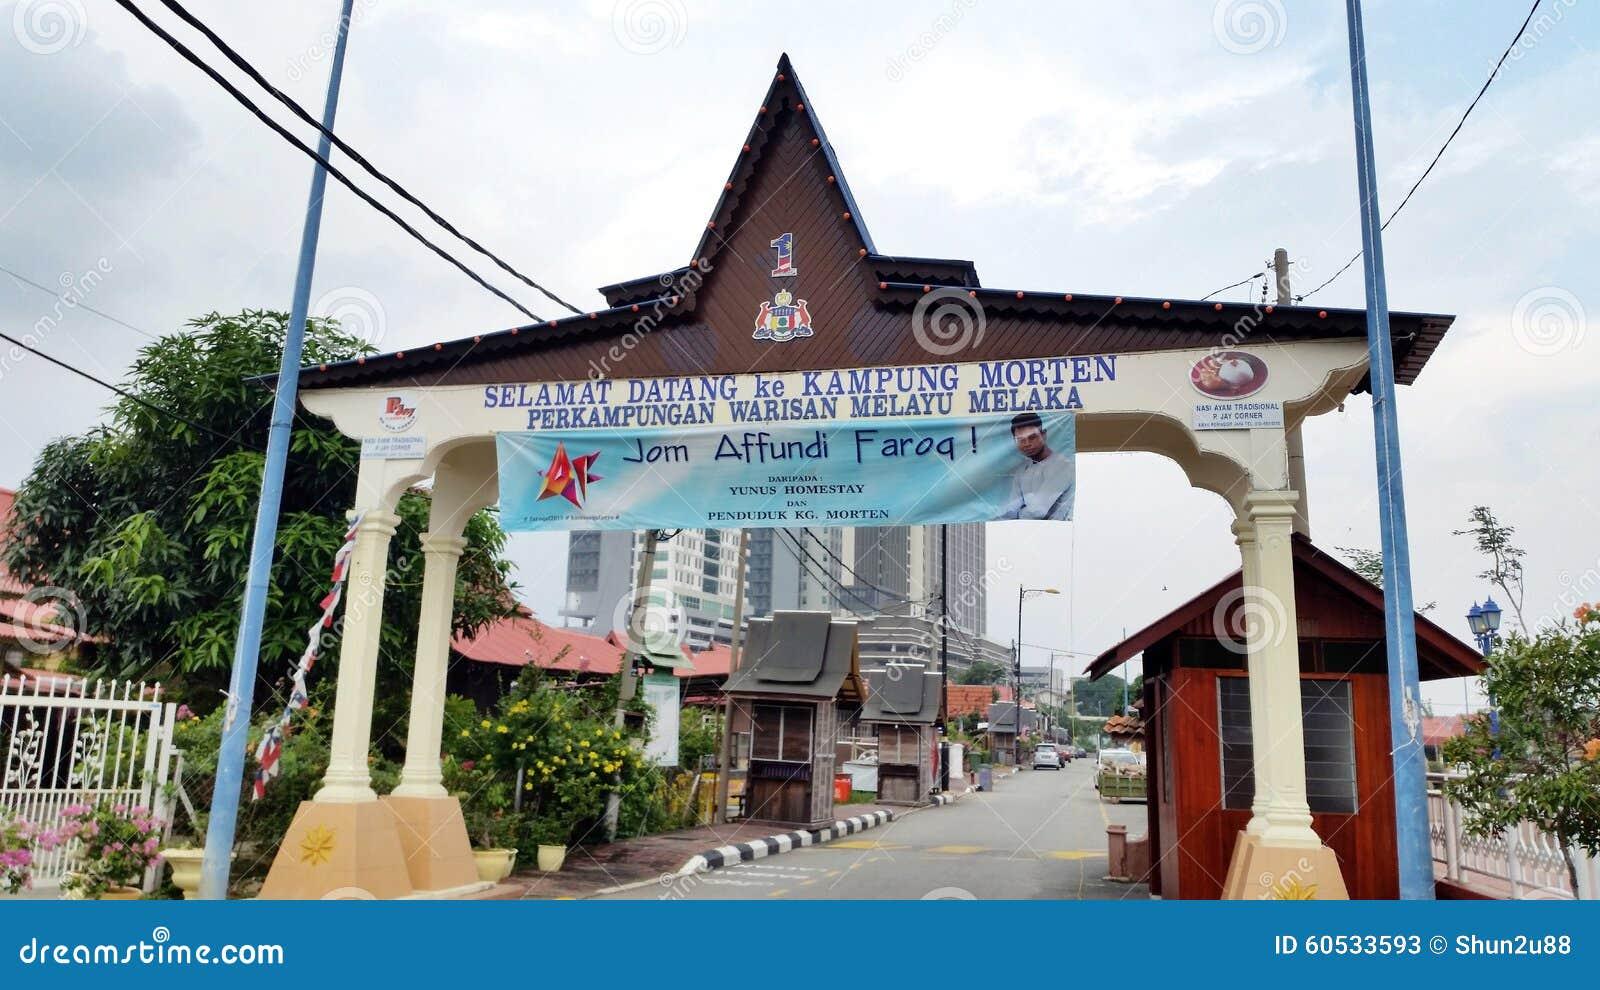 Kampung Morten Melaka ditorial Stock Photo - Image: 60533593 - ^